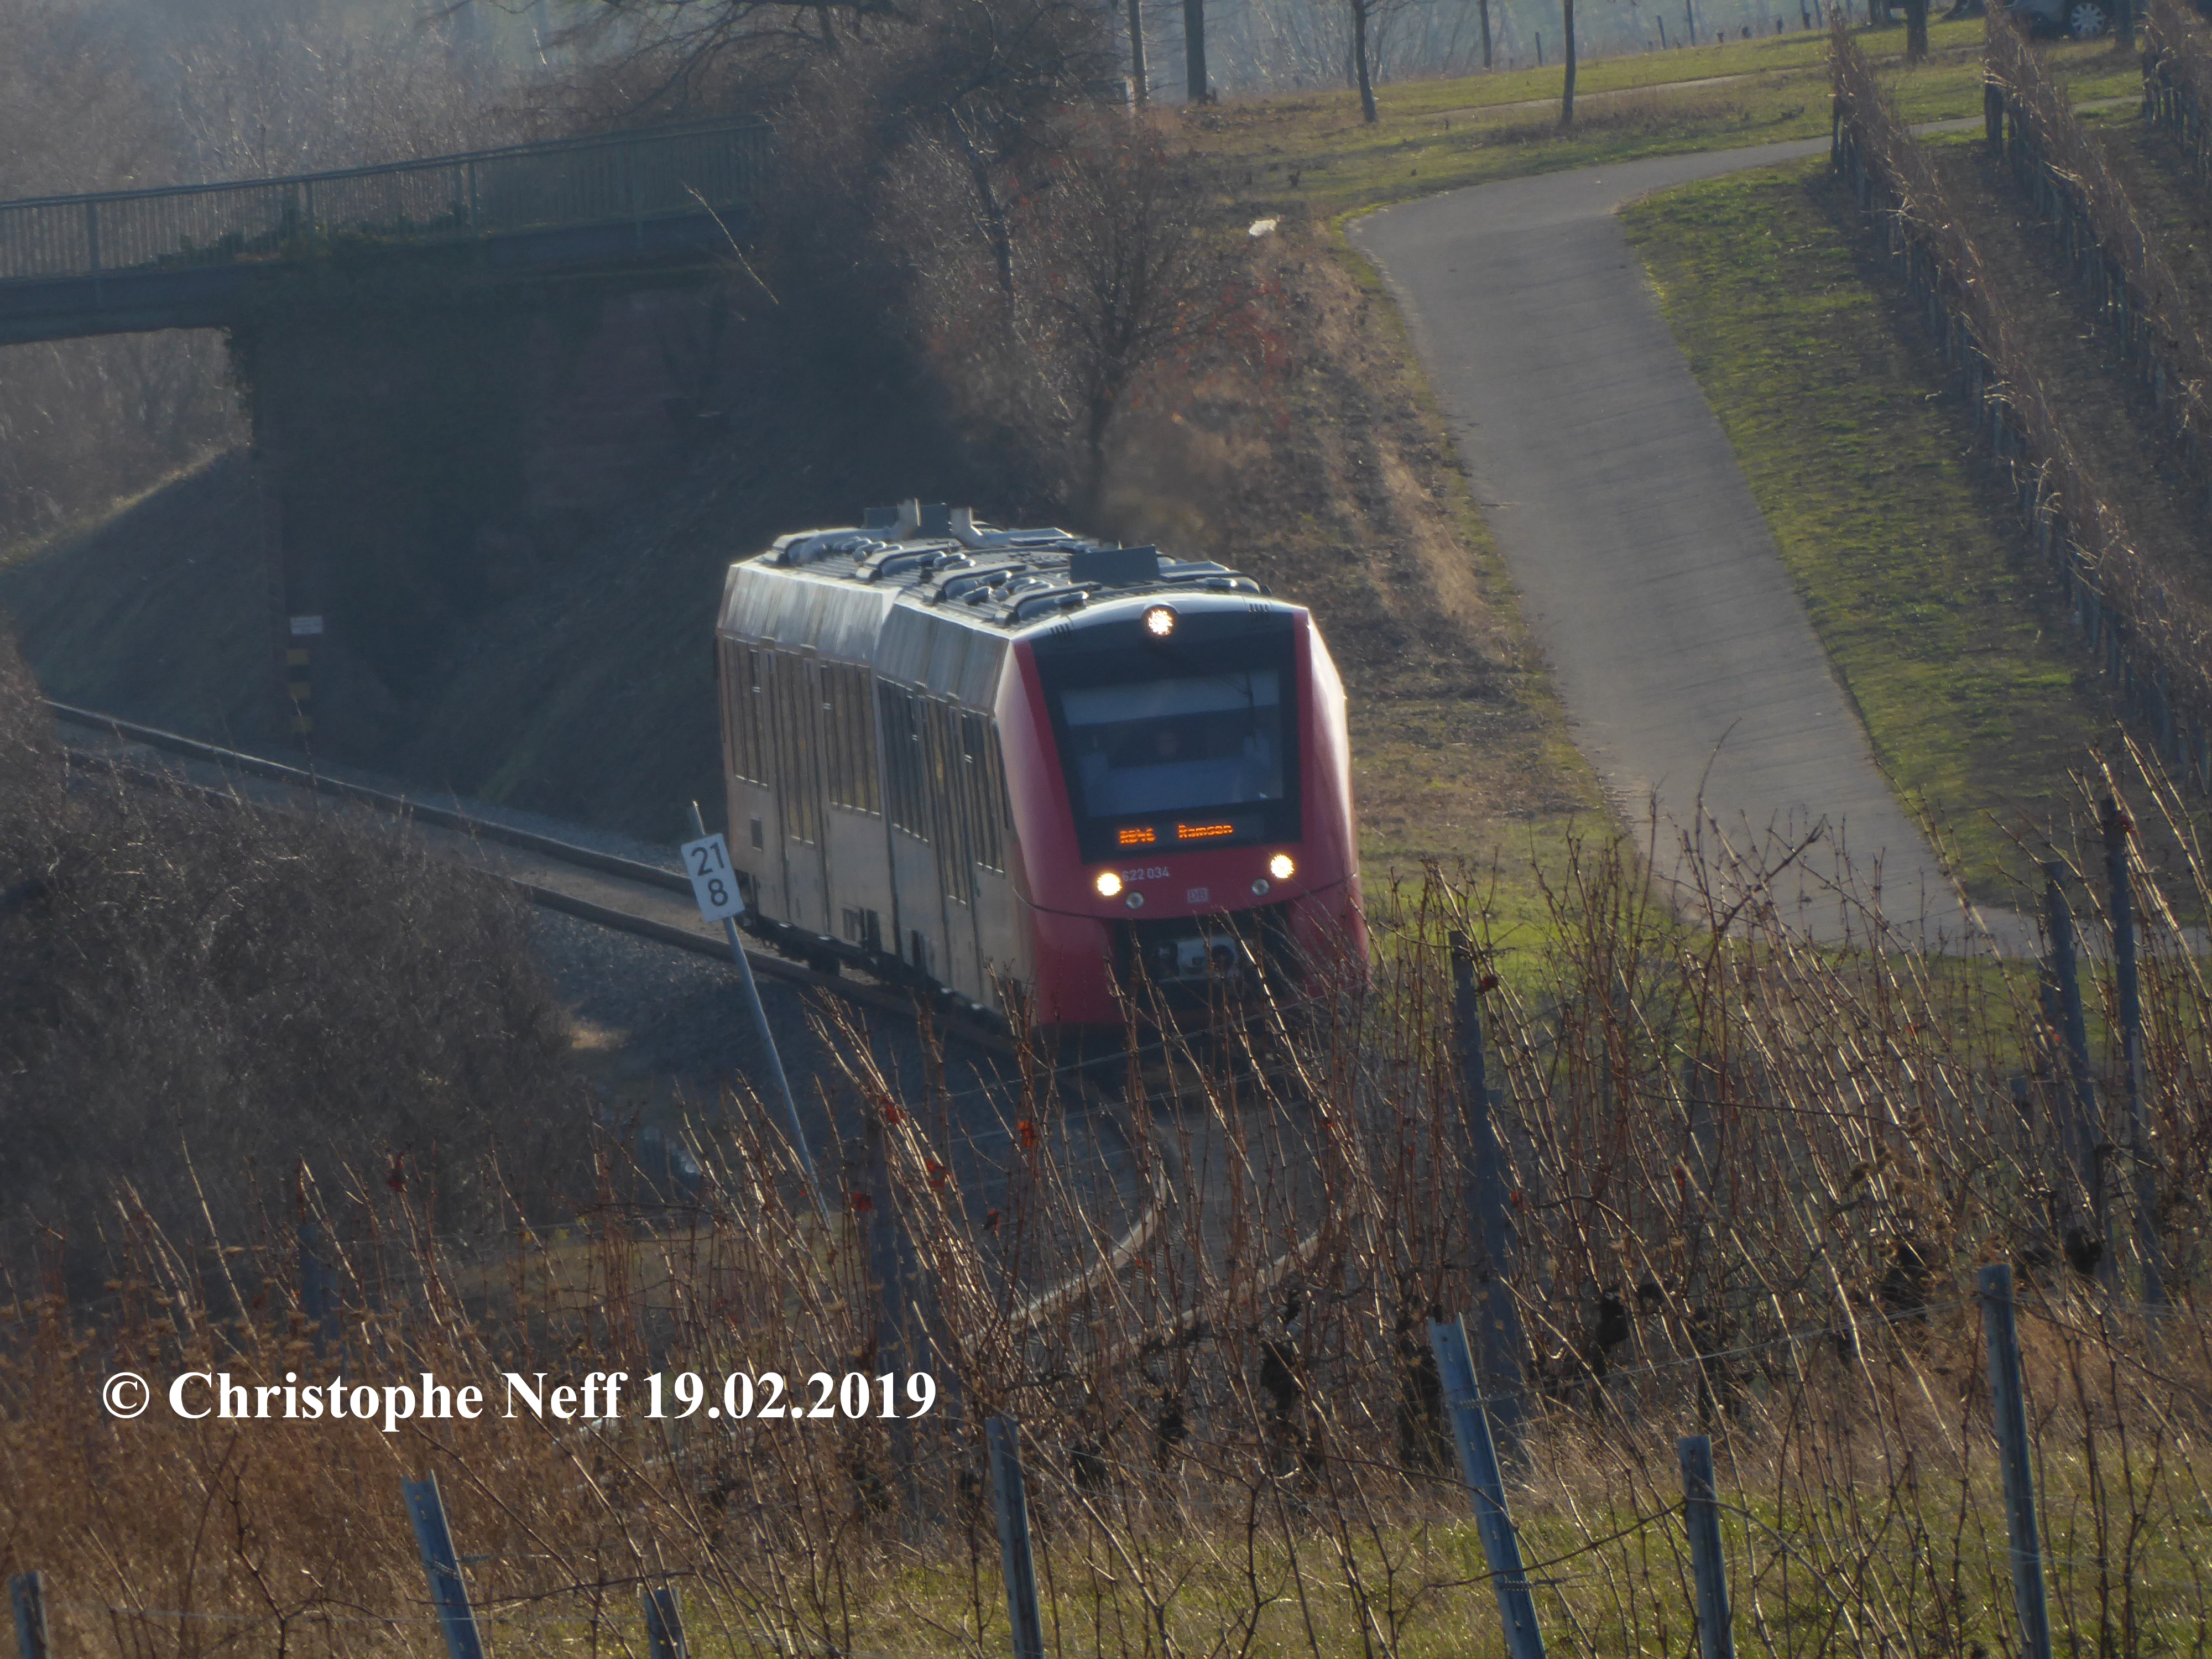 622 034 file vers Ramsen (19.02.2019)